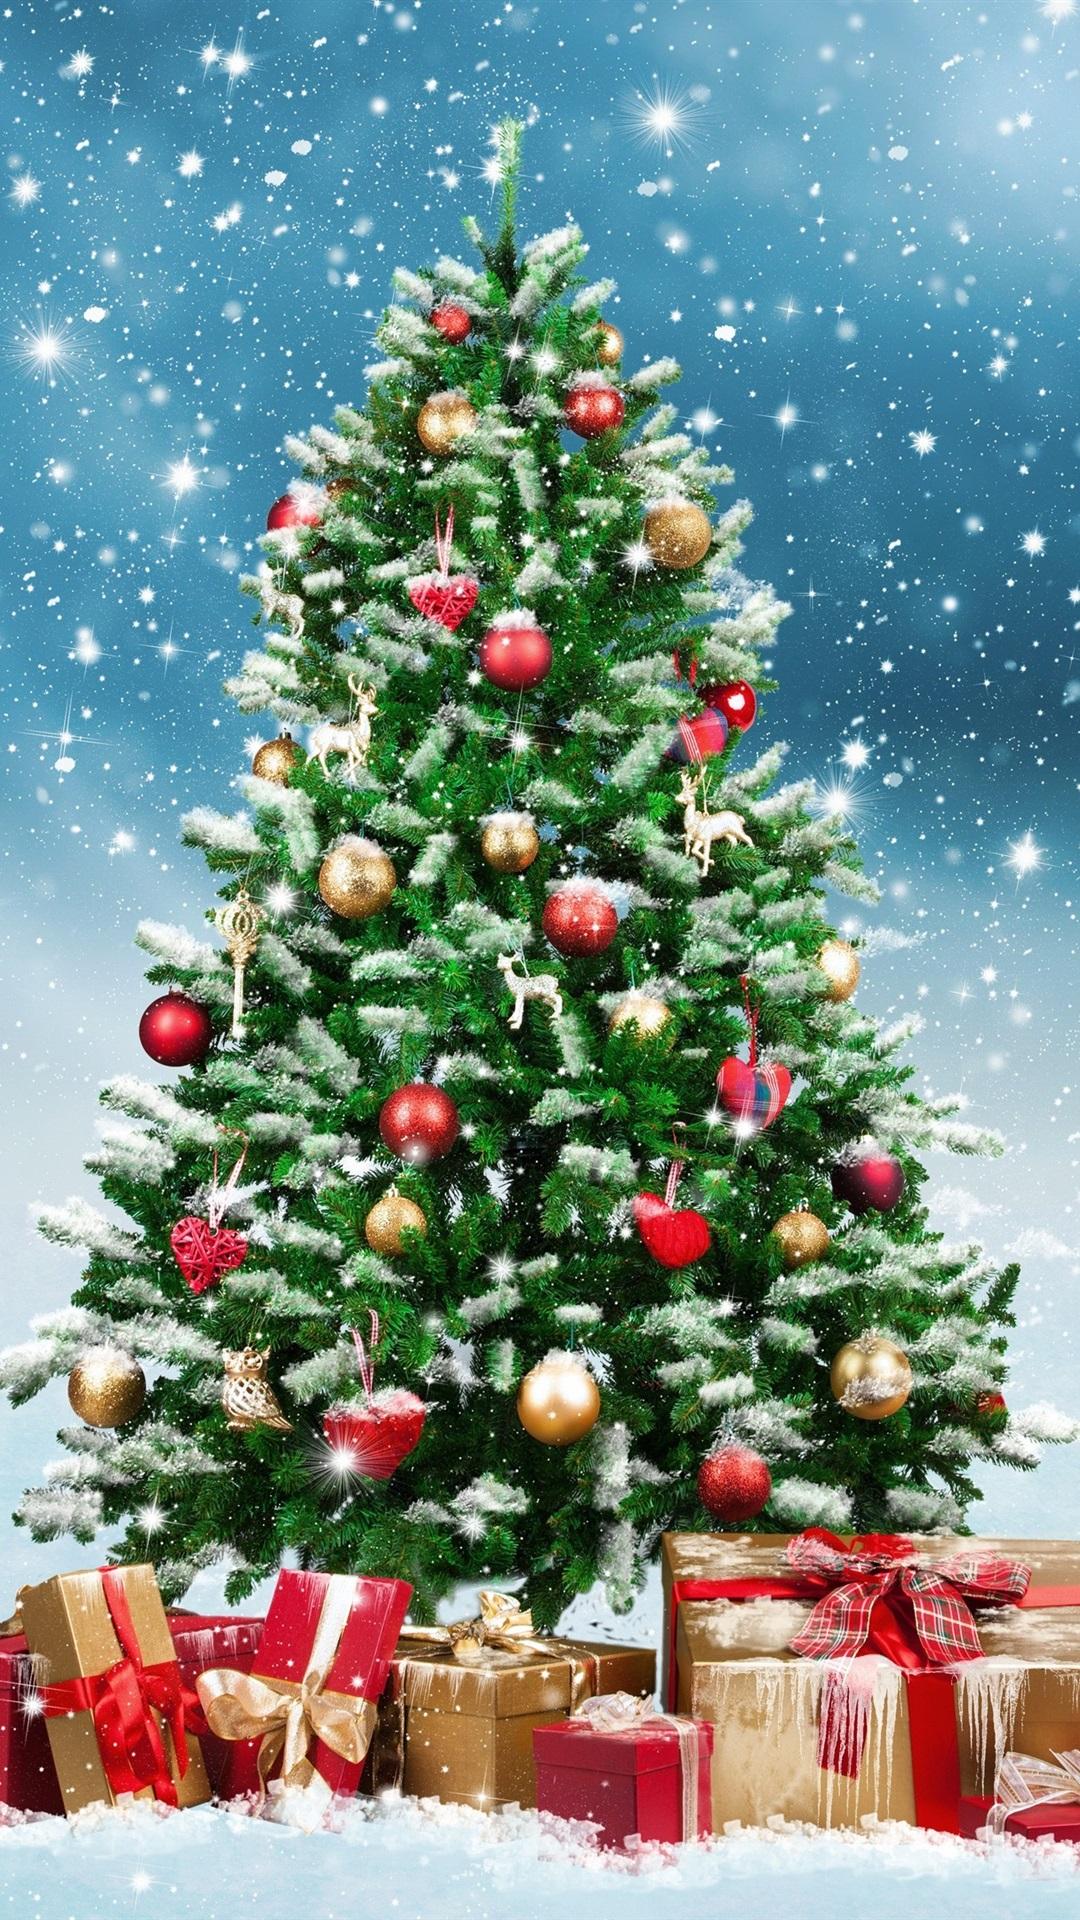 Christmas Tree Gifts Snowflakes Winter Snow 1080x1920